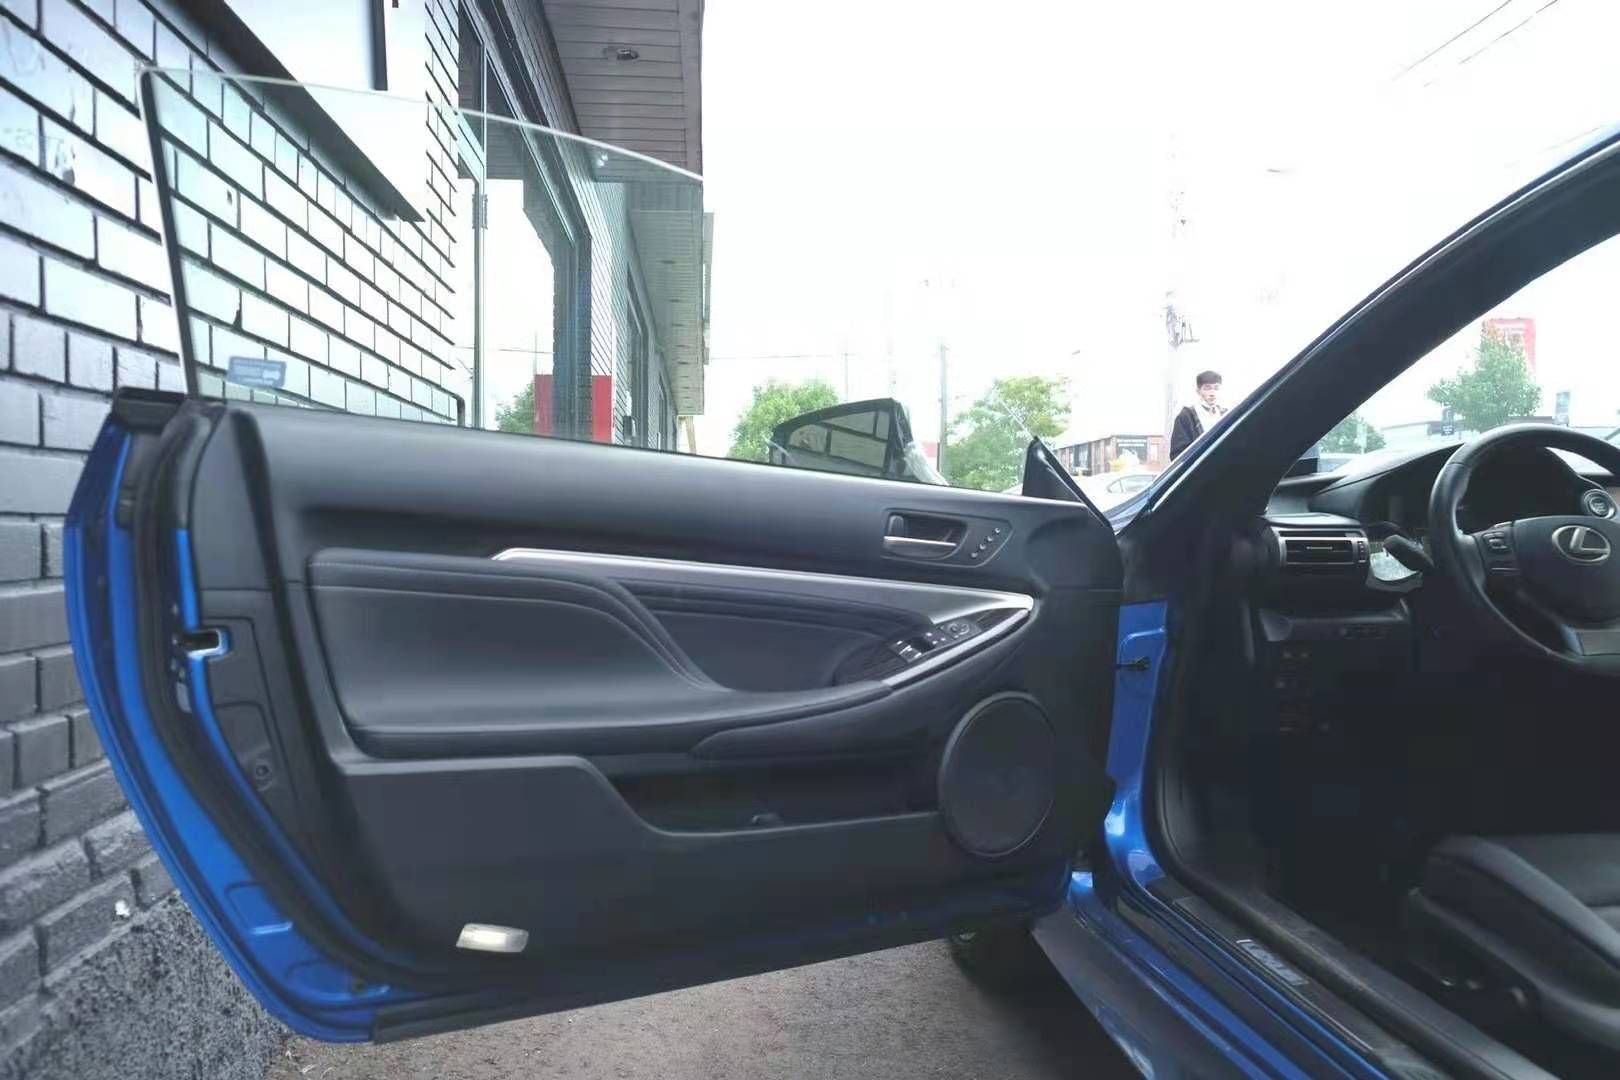 2019 Lexus RC 300 RC300  - INFOCAR - Toronto's Most Comprehensive New and Used Auto Trading Platform